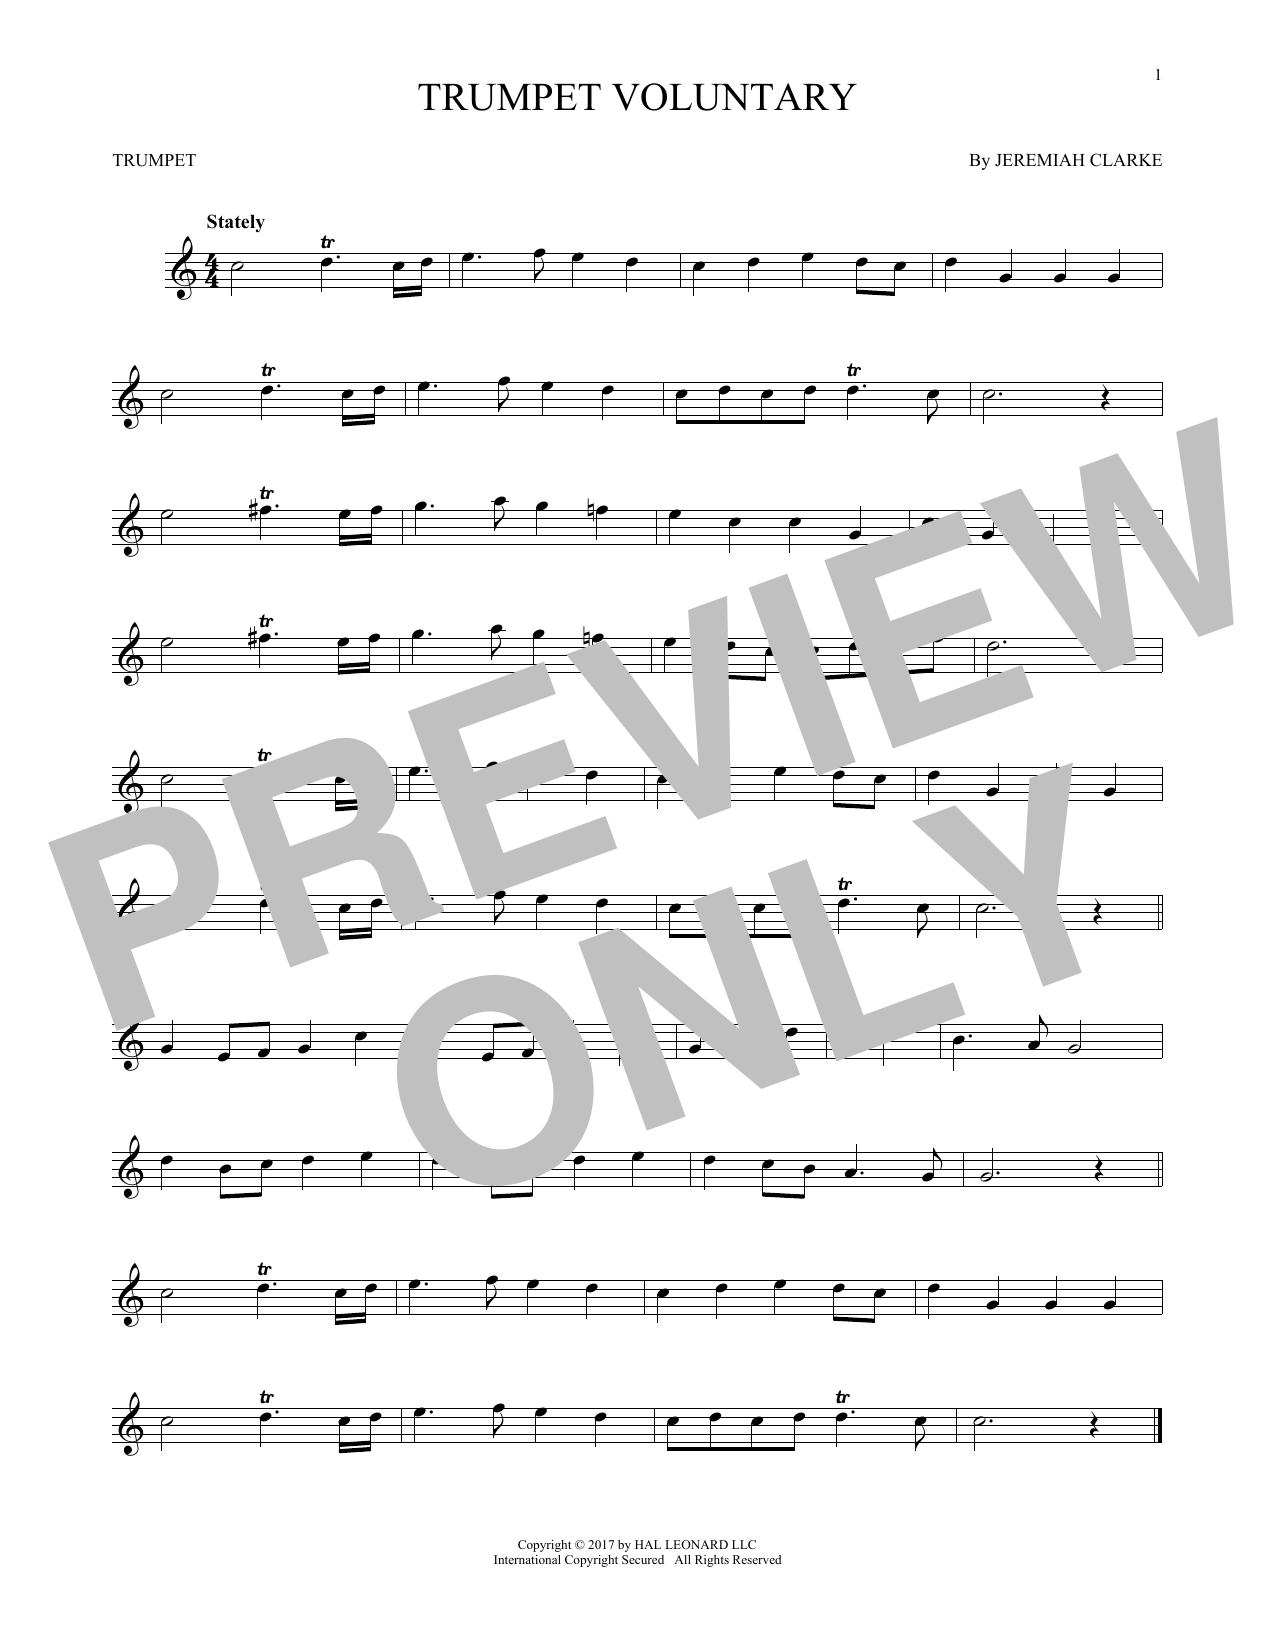 Trumpet Voluntary (Trumpet Solo)